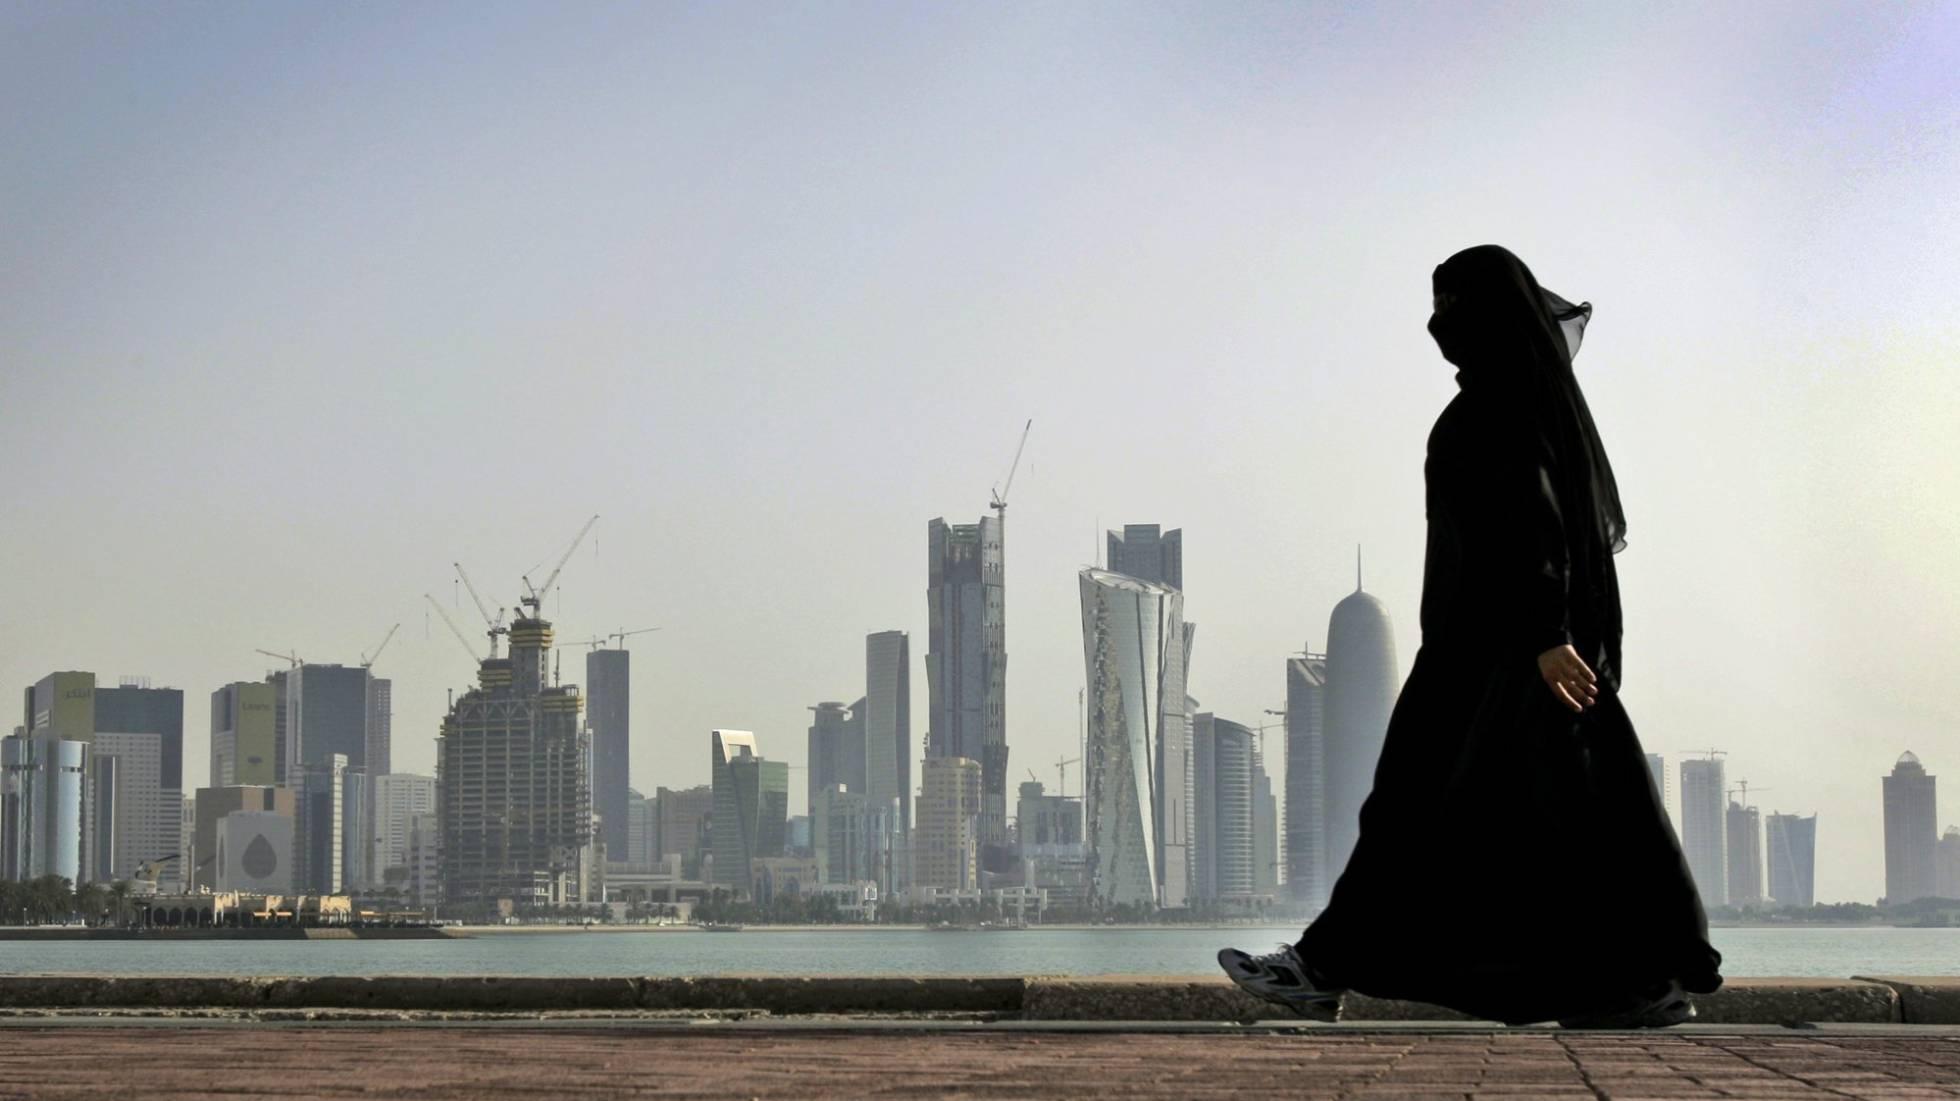 Arabia Saudita, Egipto, Bahréin y Emiratos Árabes Unidos cortaron relaciones diplomáticas con Qatar 1496683078_871556_1496684170_noticia_normal_recorte1